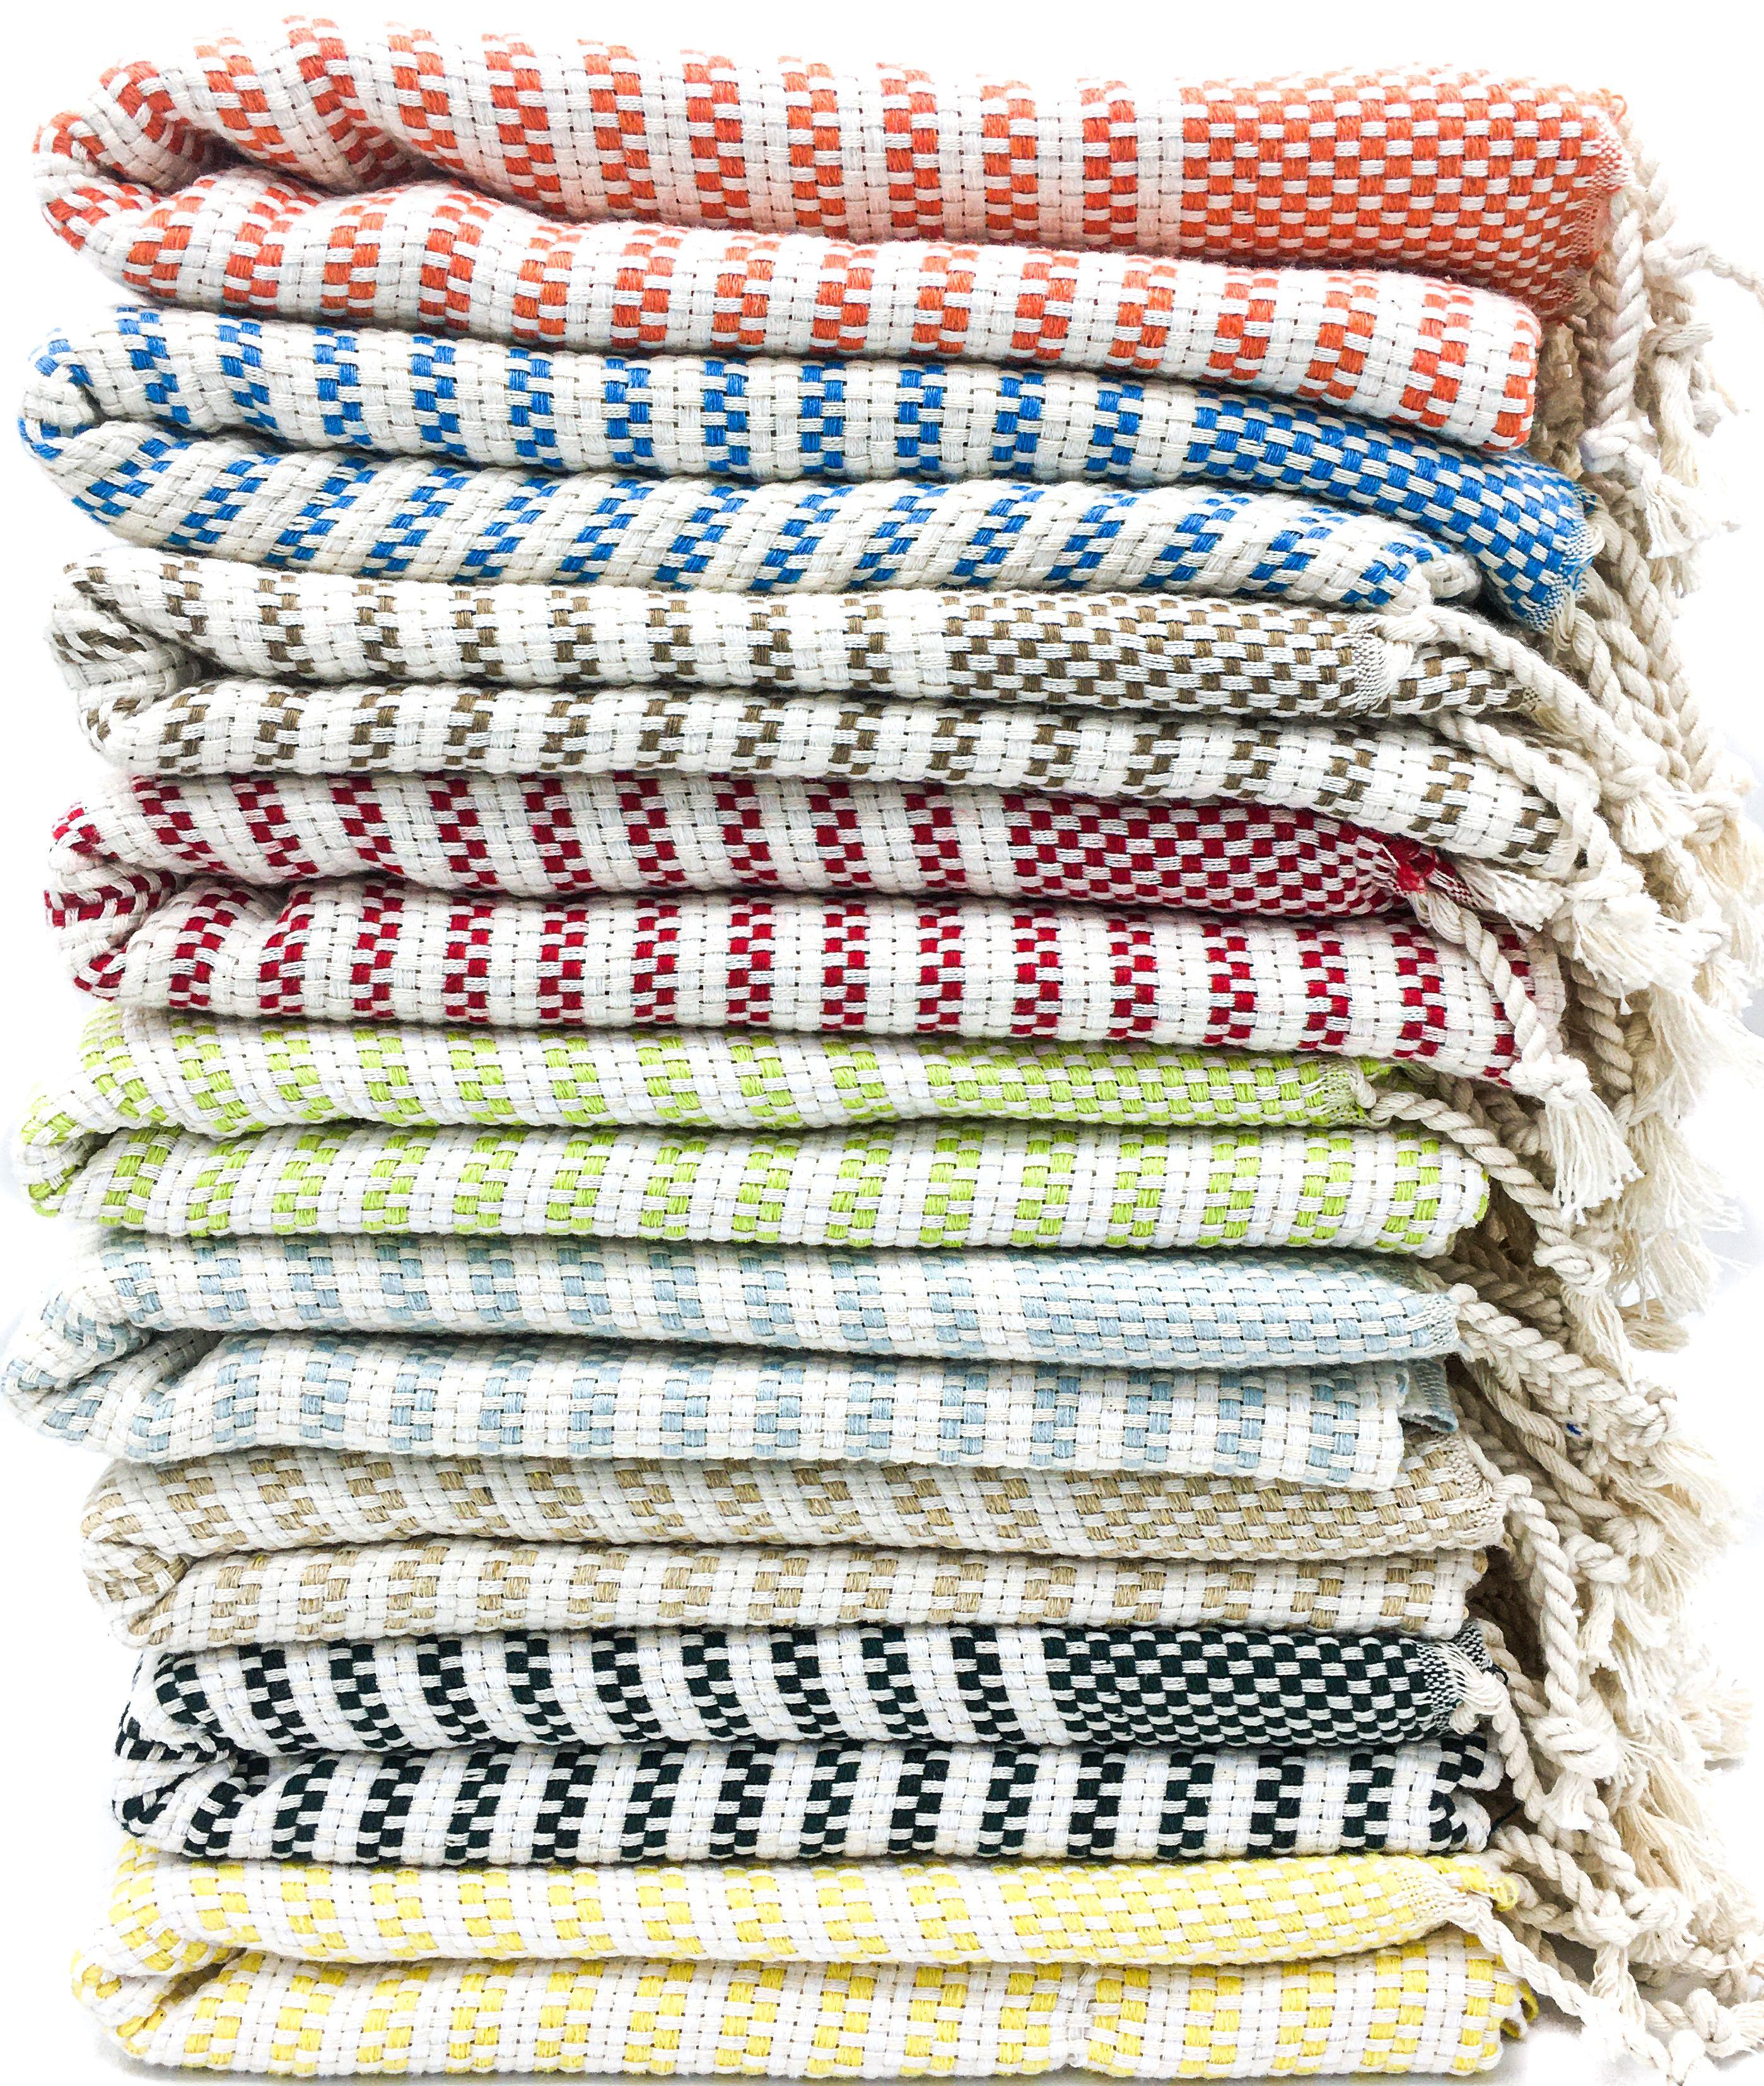 Turkish Towel Throw Blanket Bed Throw Turkish Blanket Bulk